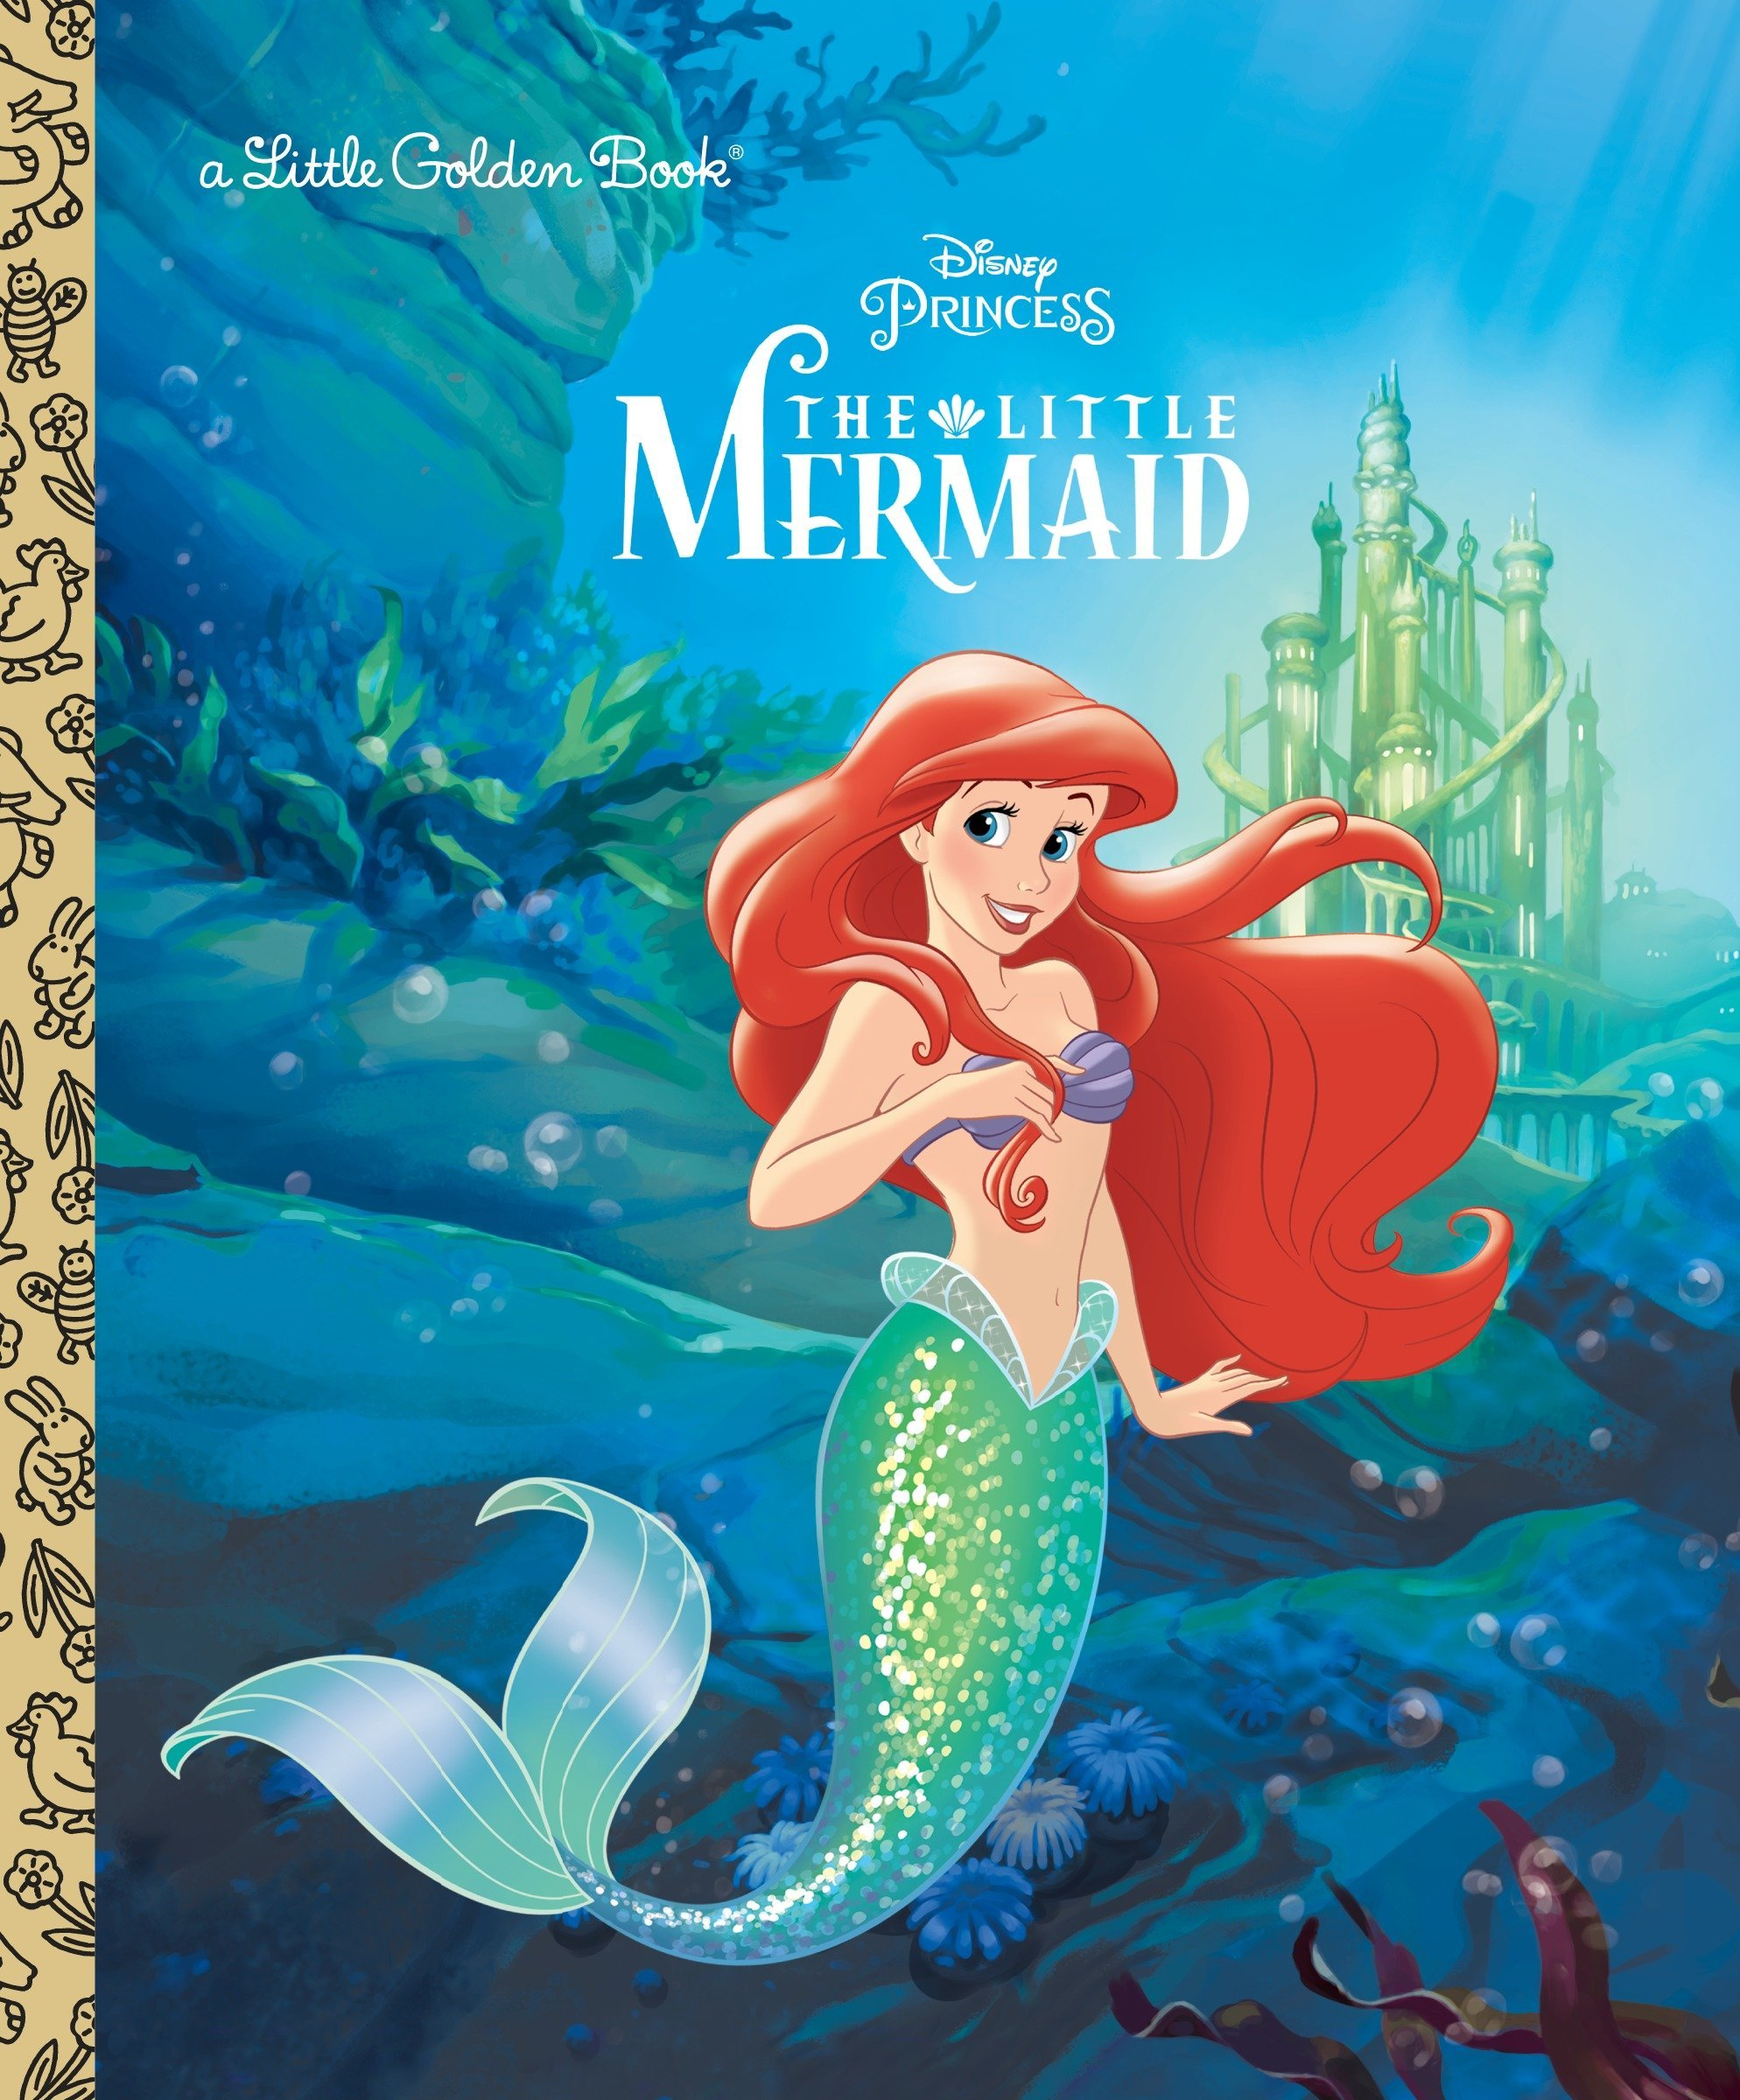 Ariel Story Time & Craft (virtual)